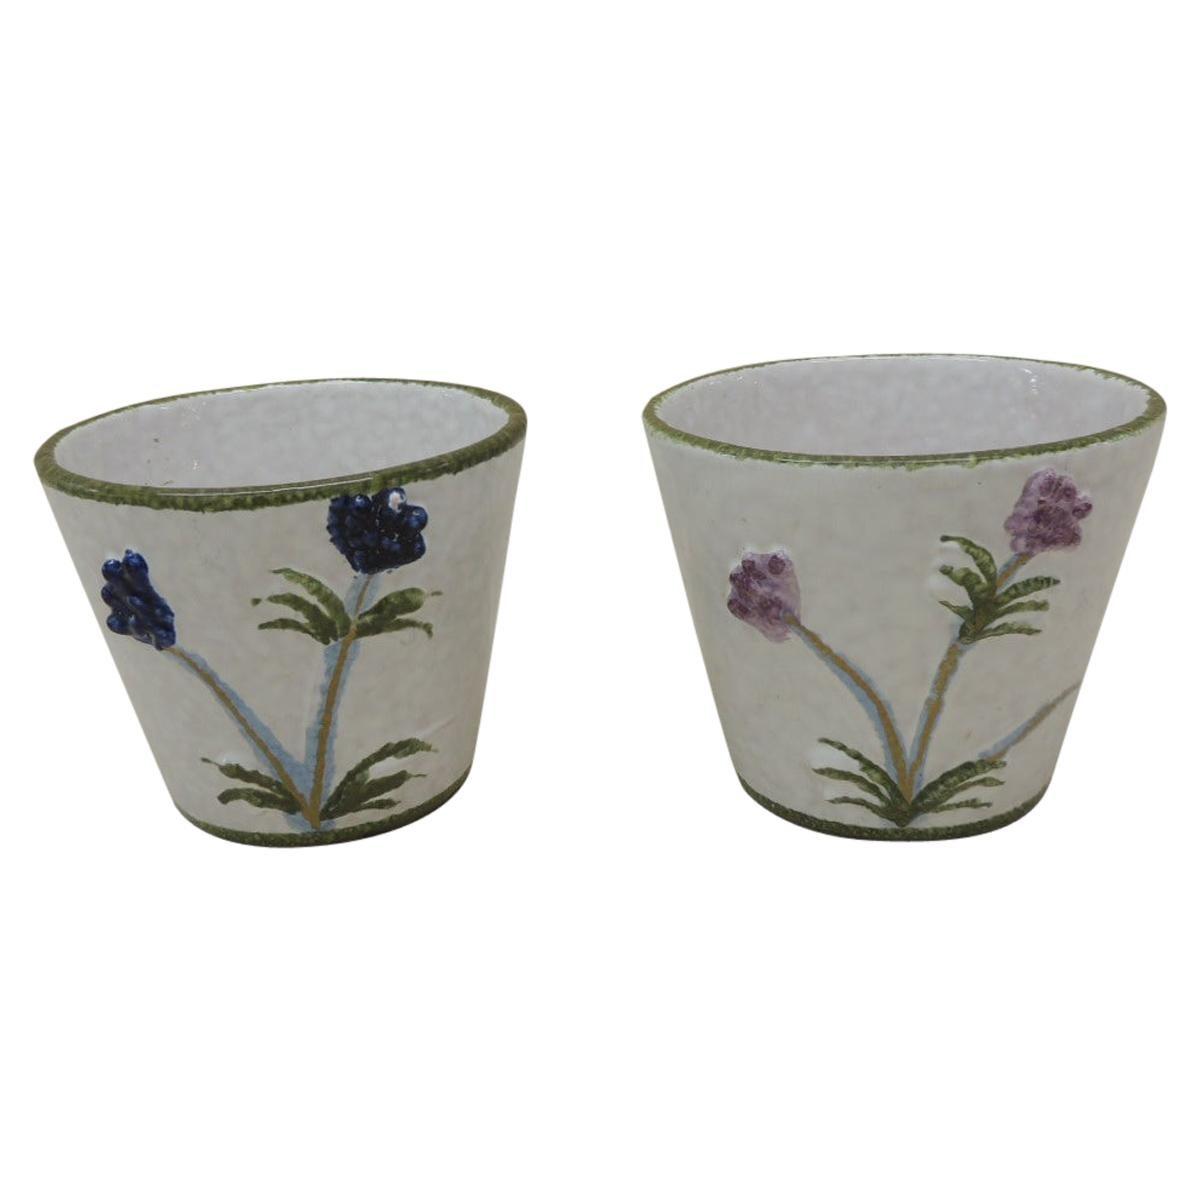 Pair of Italian Hand Painted Round Decorative Planters